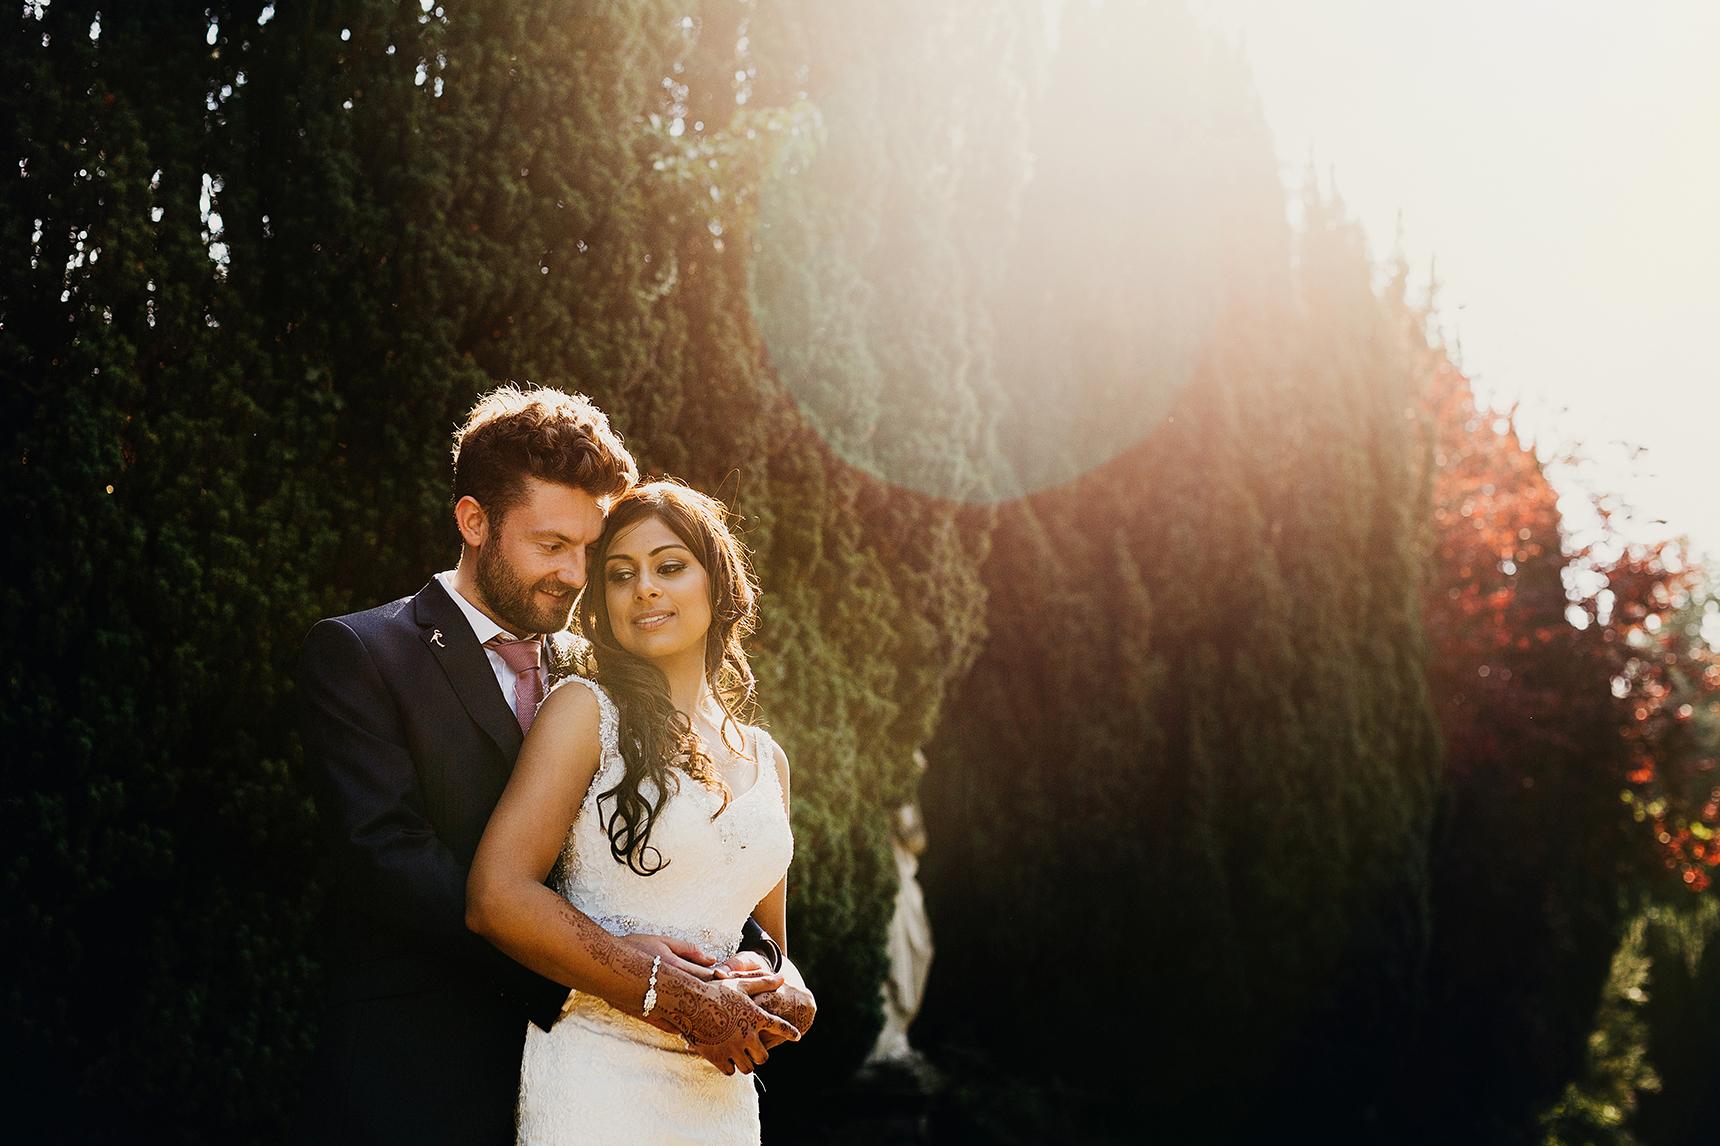 Weddings at Newby Hall